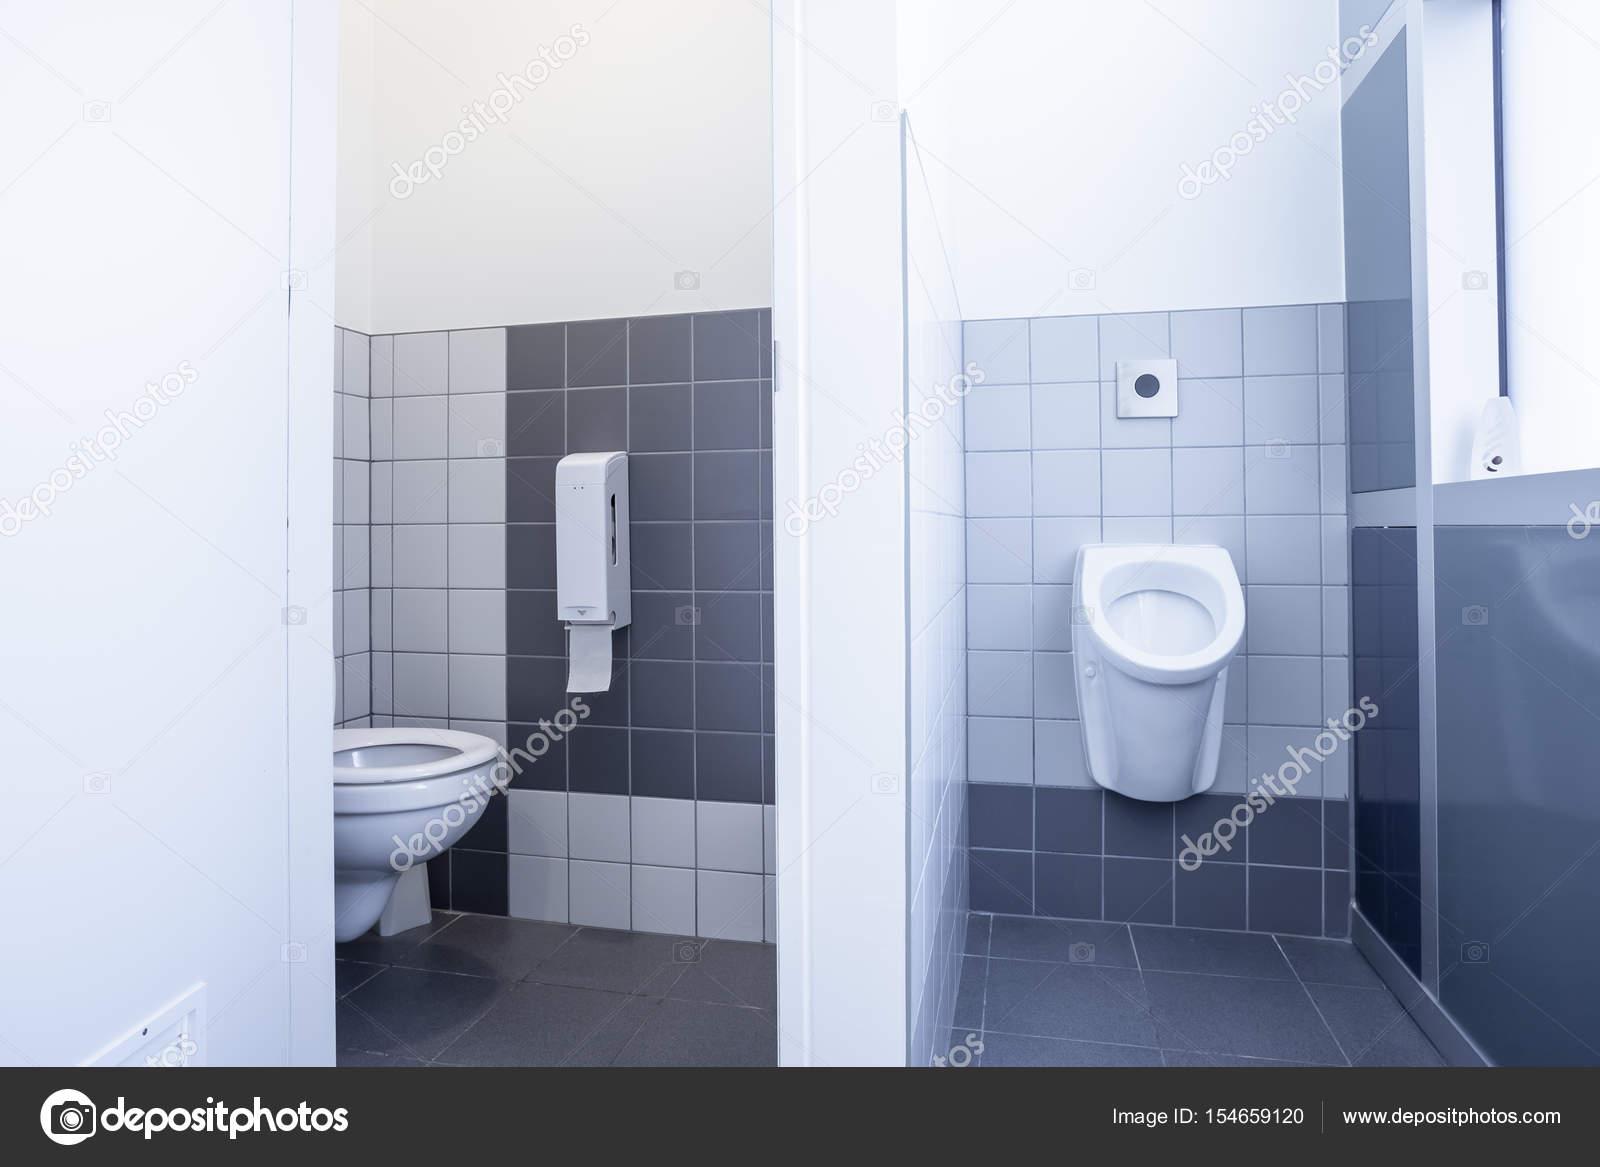 Urinoir en toilet u stockfoto denboma